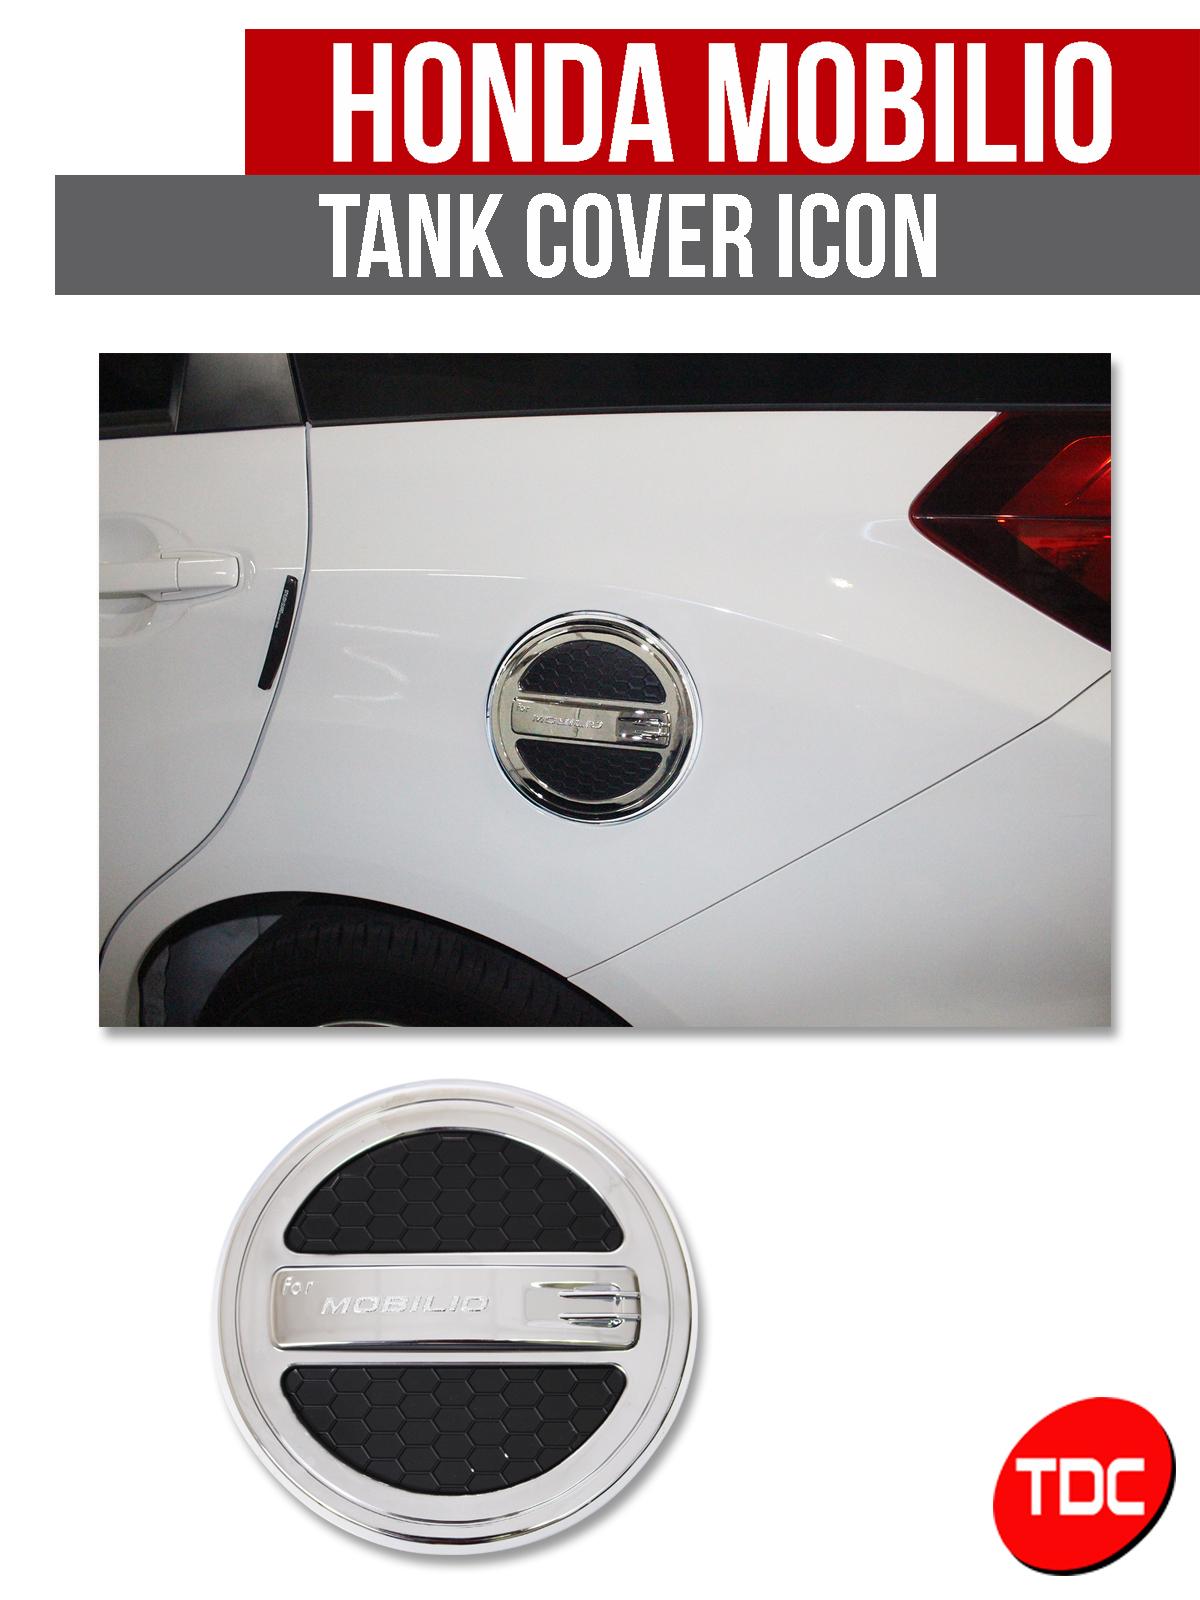 Tank Cover Model Icon Variasi (Aksesoris) Honda Mobilio - TDC